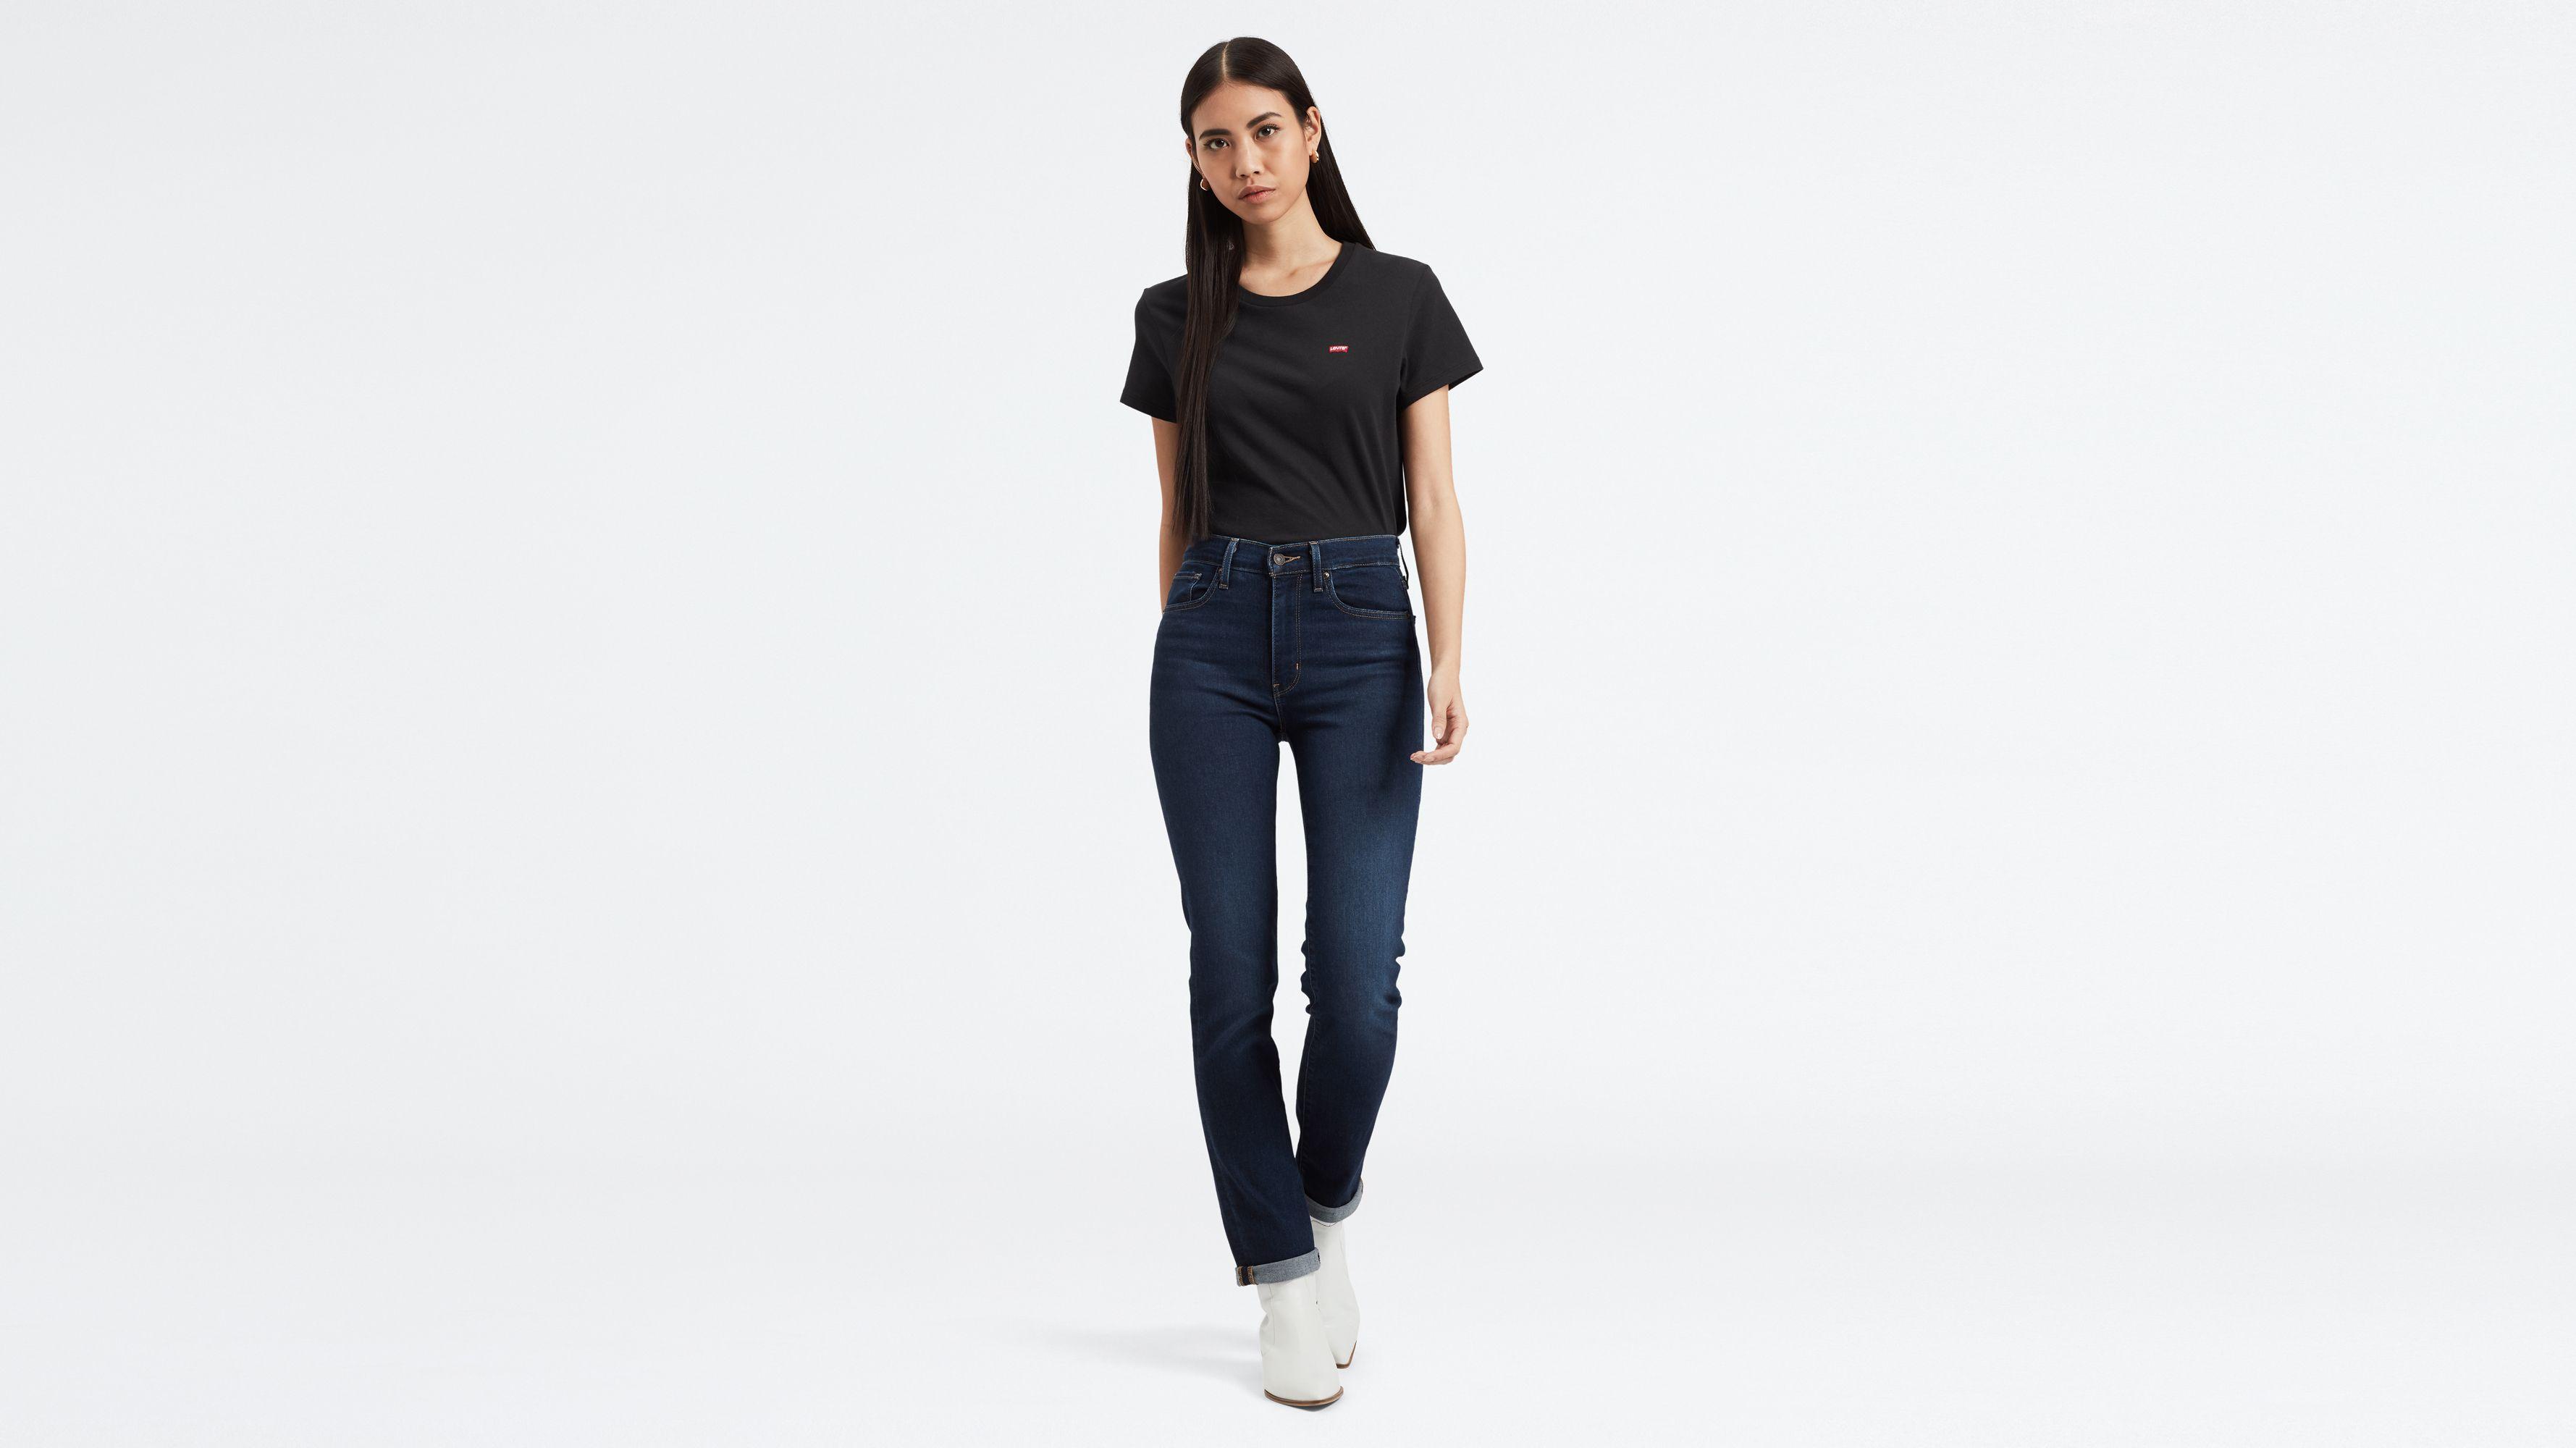 Open-Minded Mens Blue Denim Jeans Tight Leg Denim Co 34 Waist 33 Leg Button Fly Jeans Clothes, Shoes & Accessories